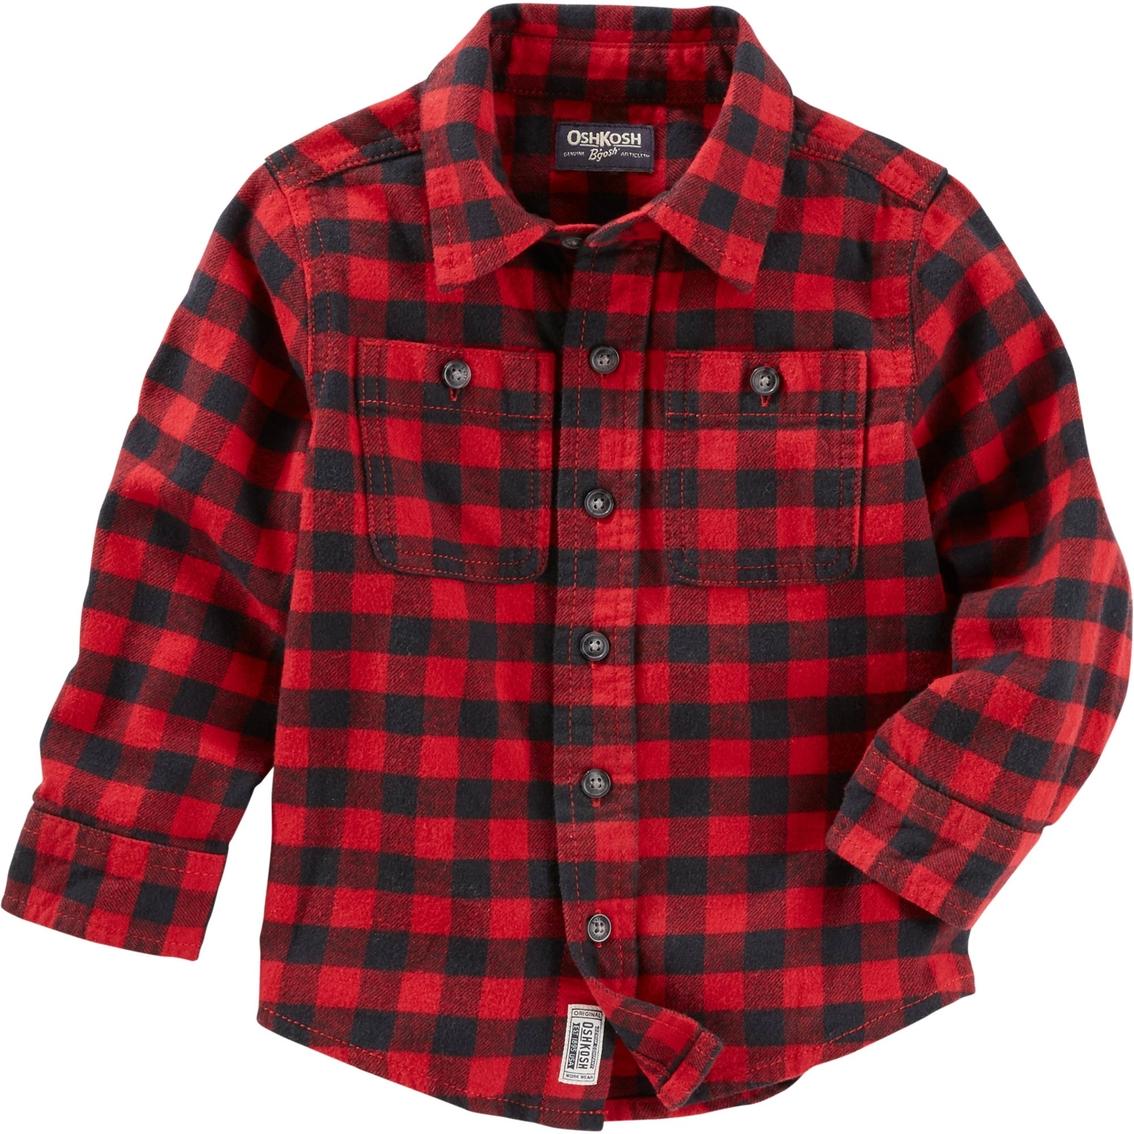 OshKosh Bgosh Toddler Boys Buffalo Check Flannel Shirt